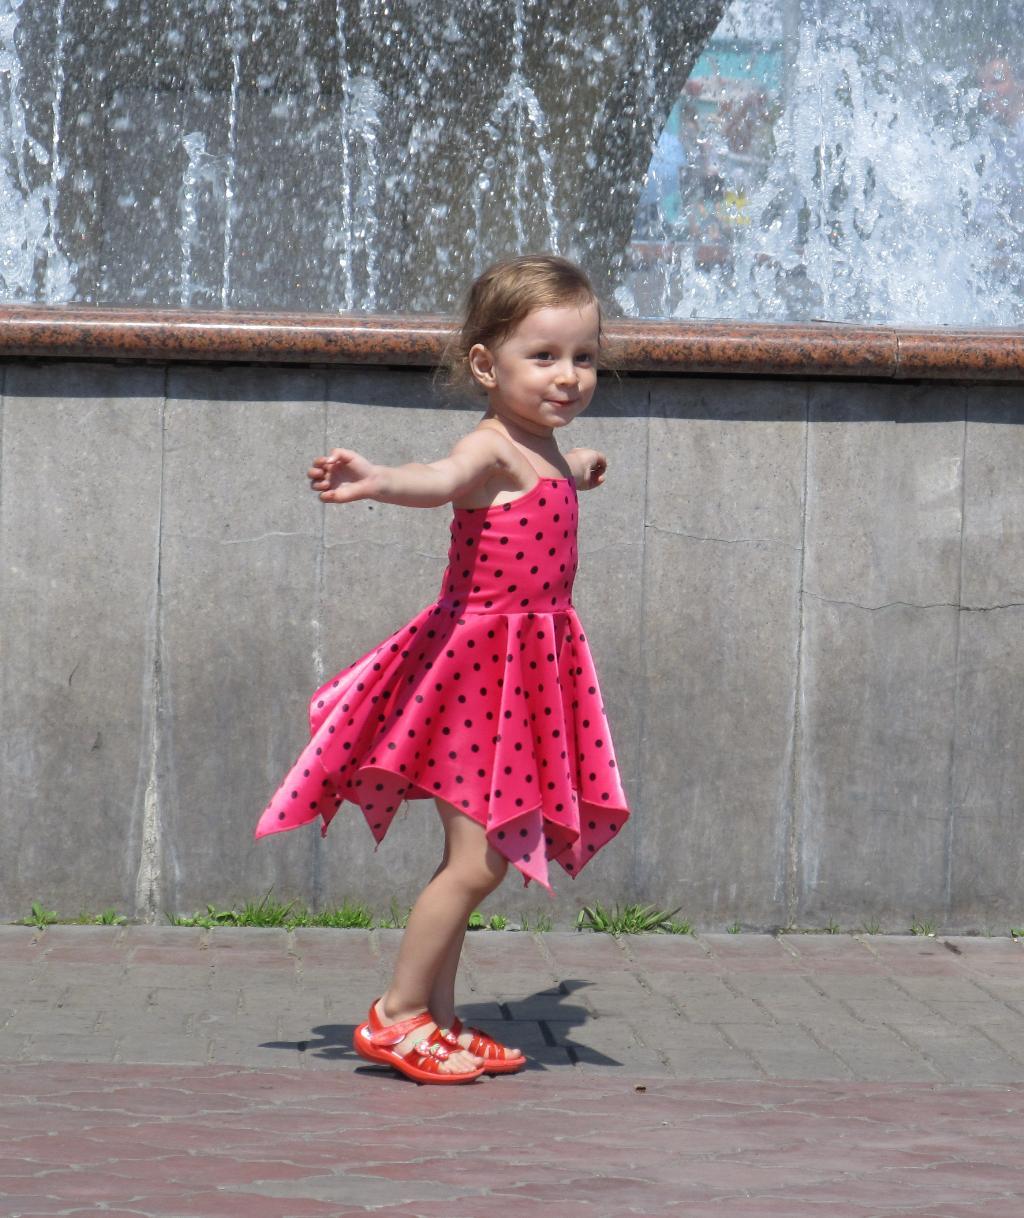 танец у фонтана . Танцуй, пока молодой!